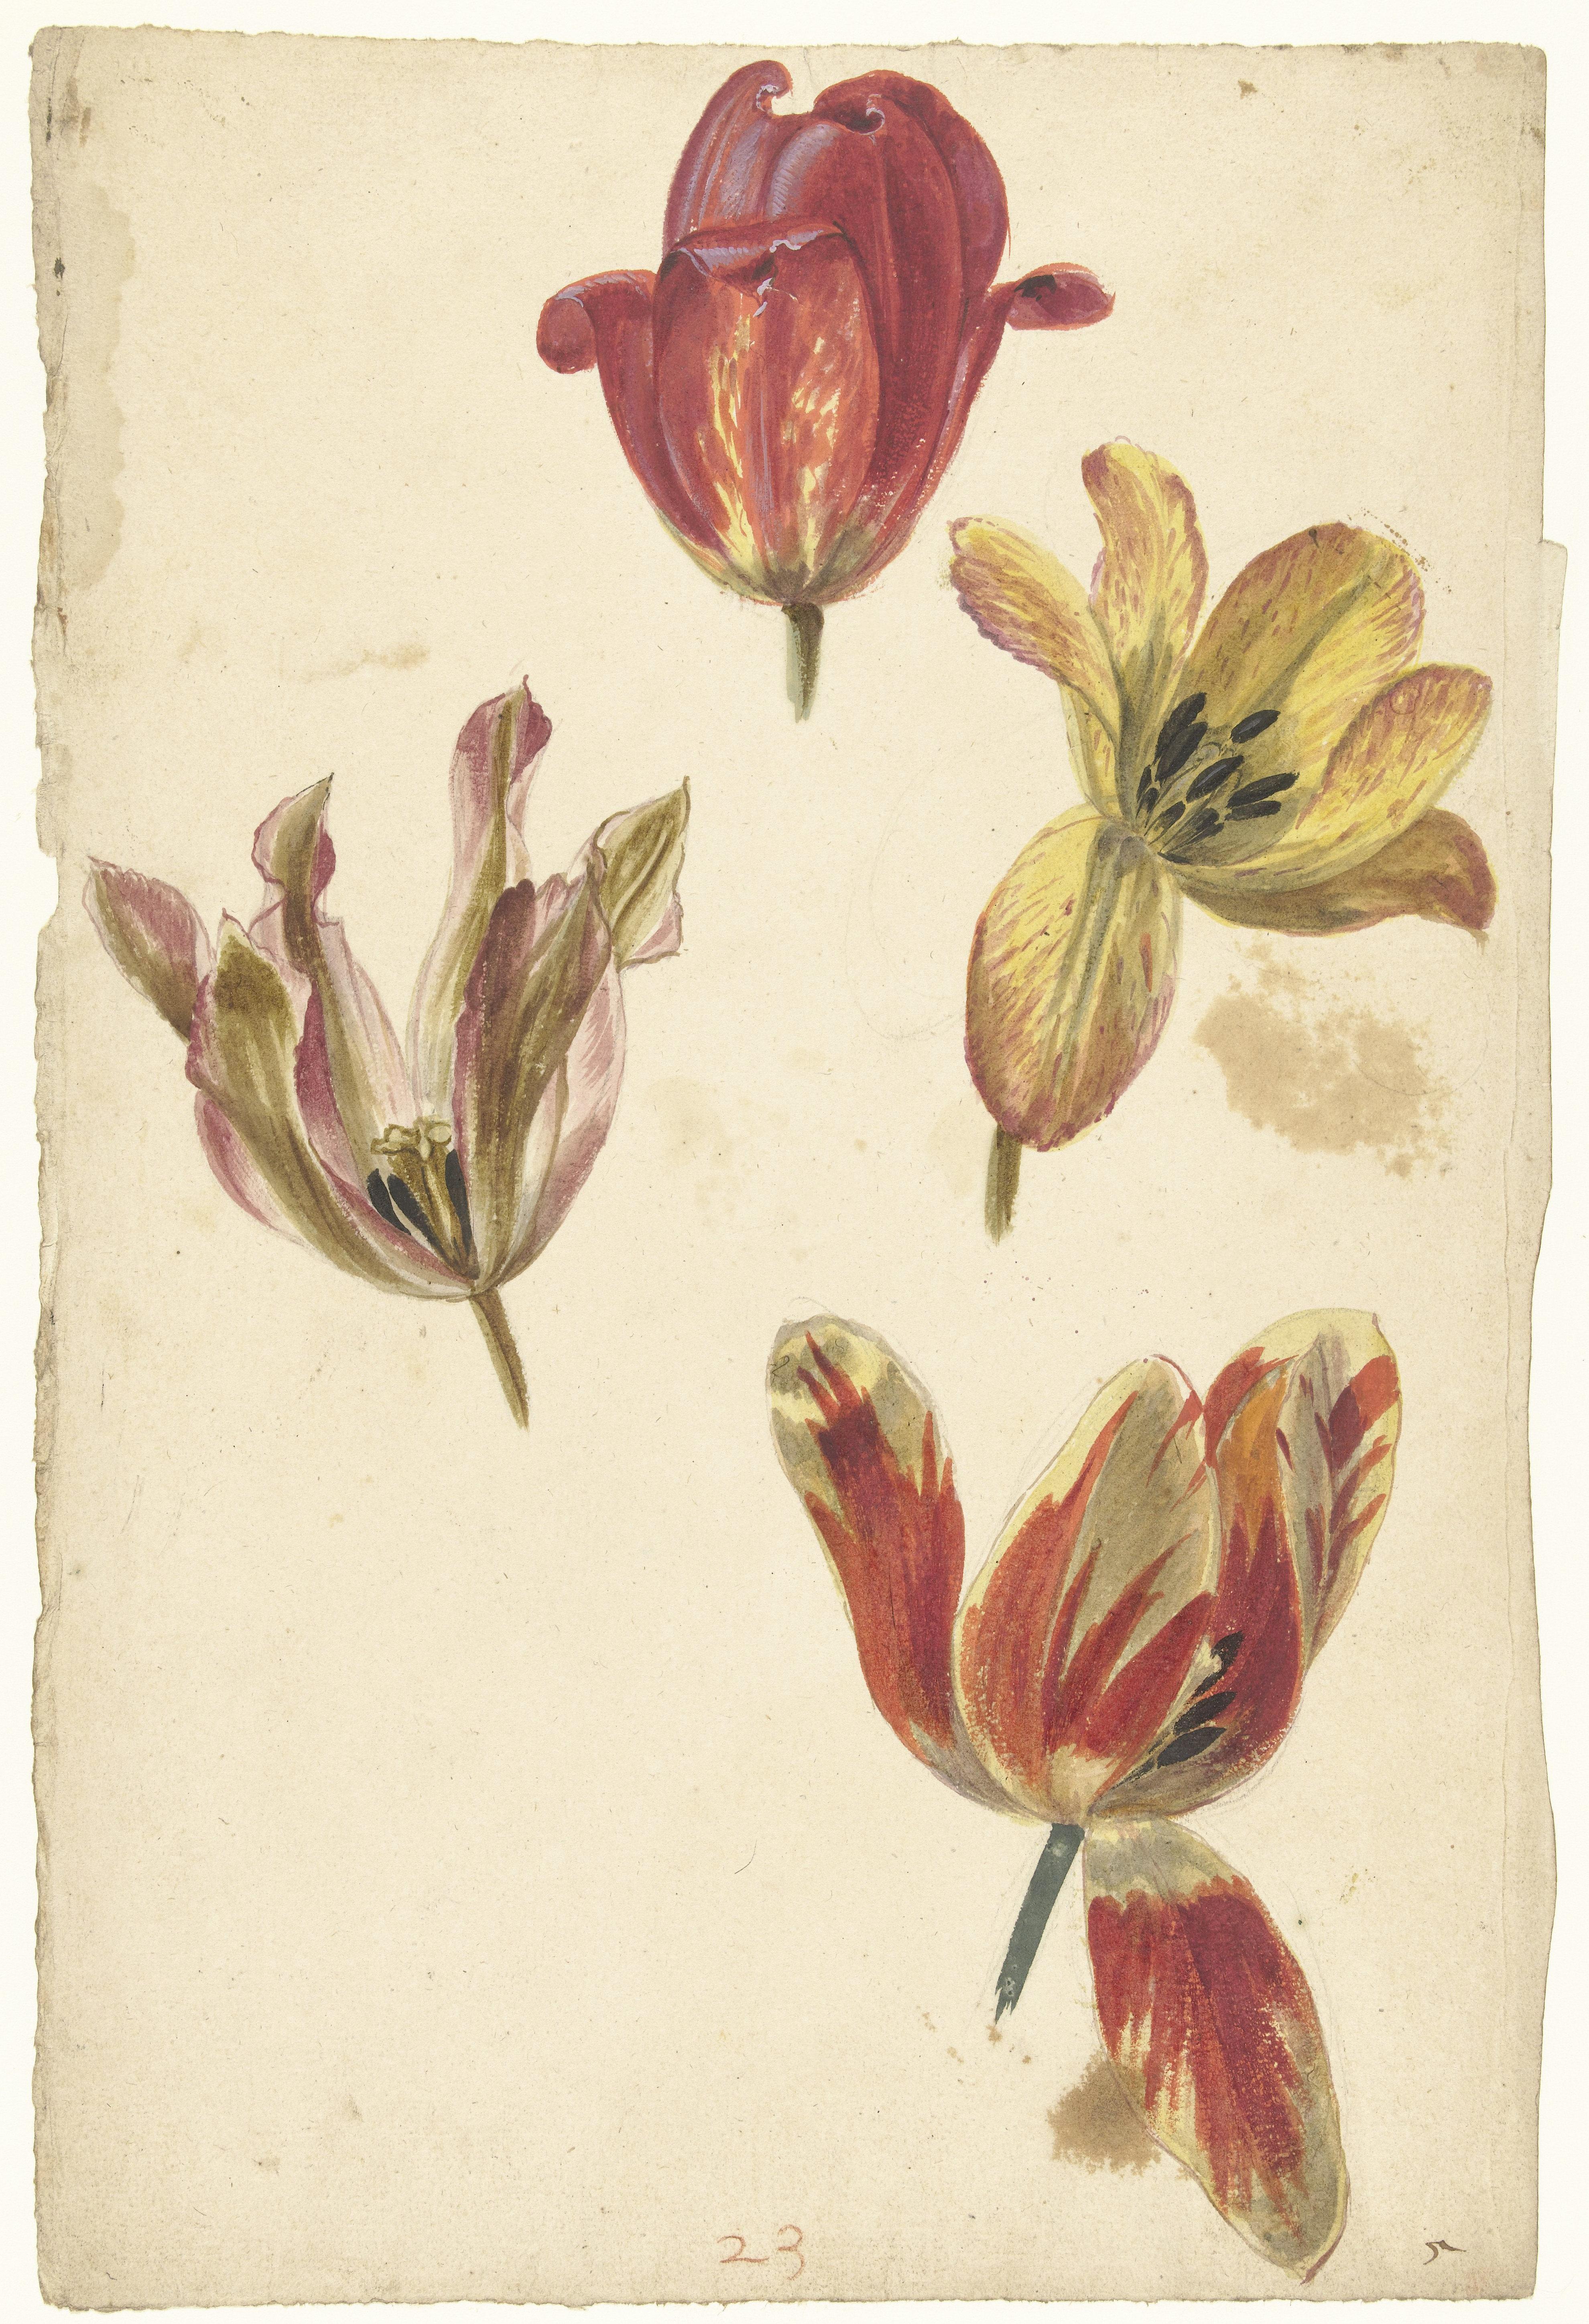 Studies of Four Tulips